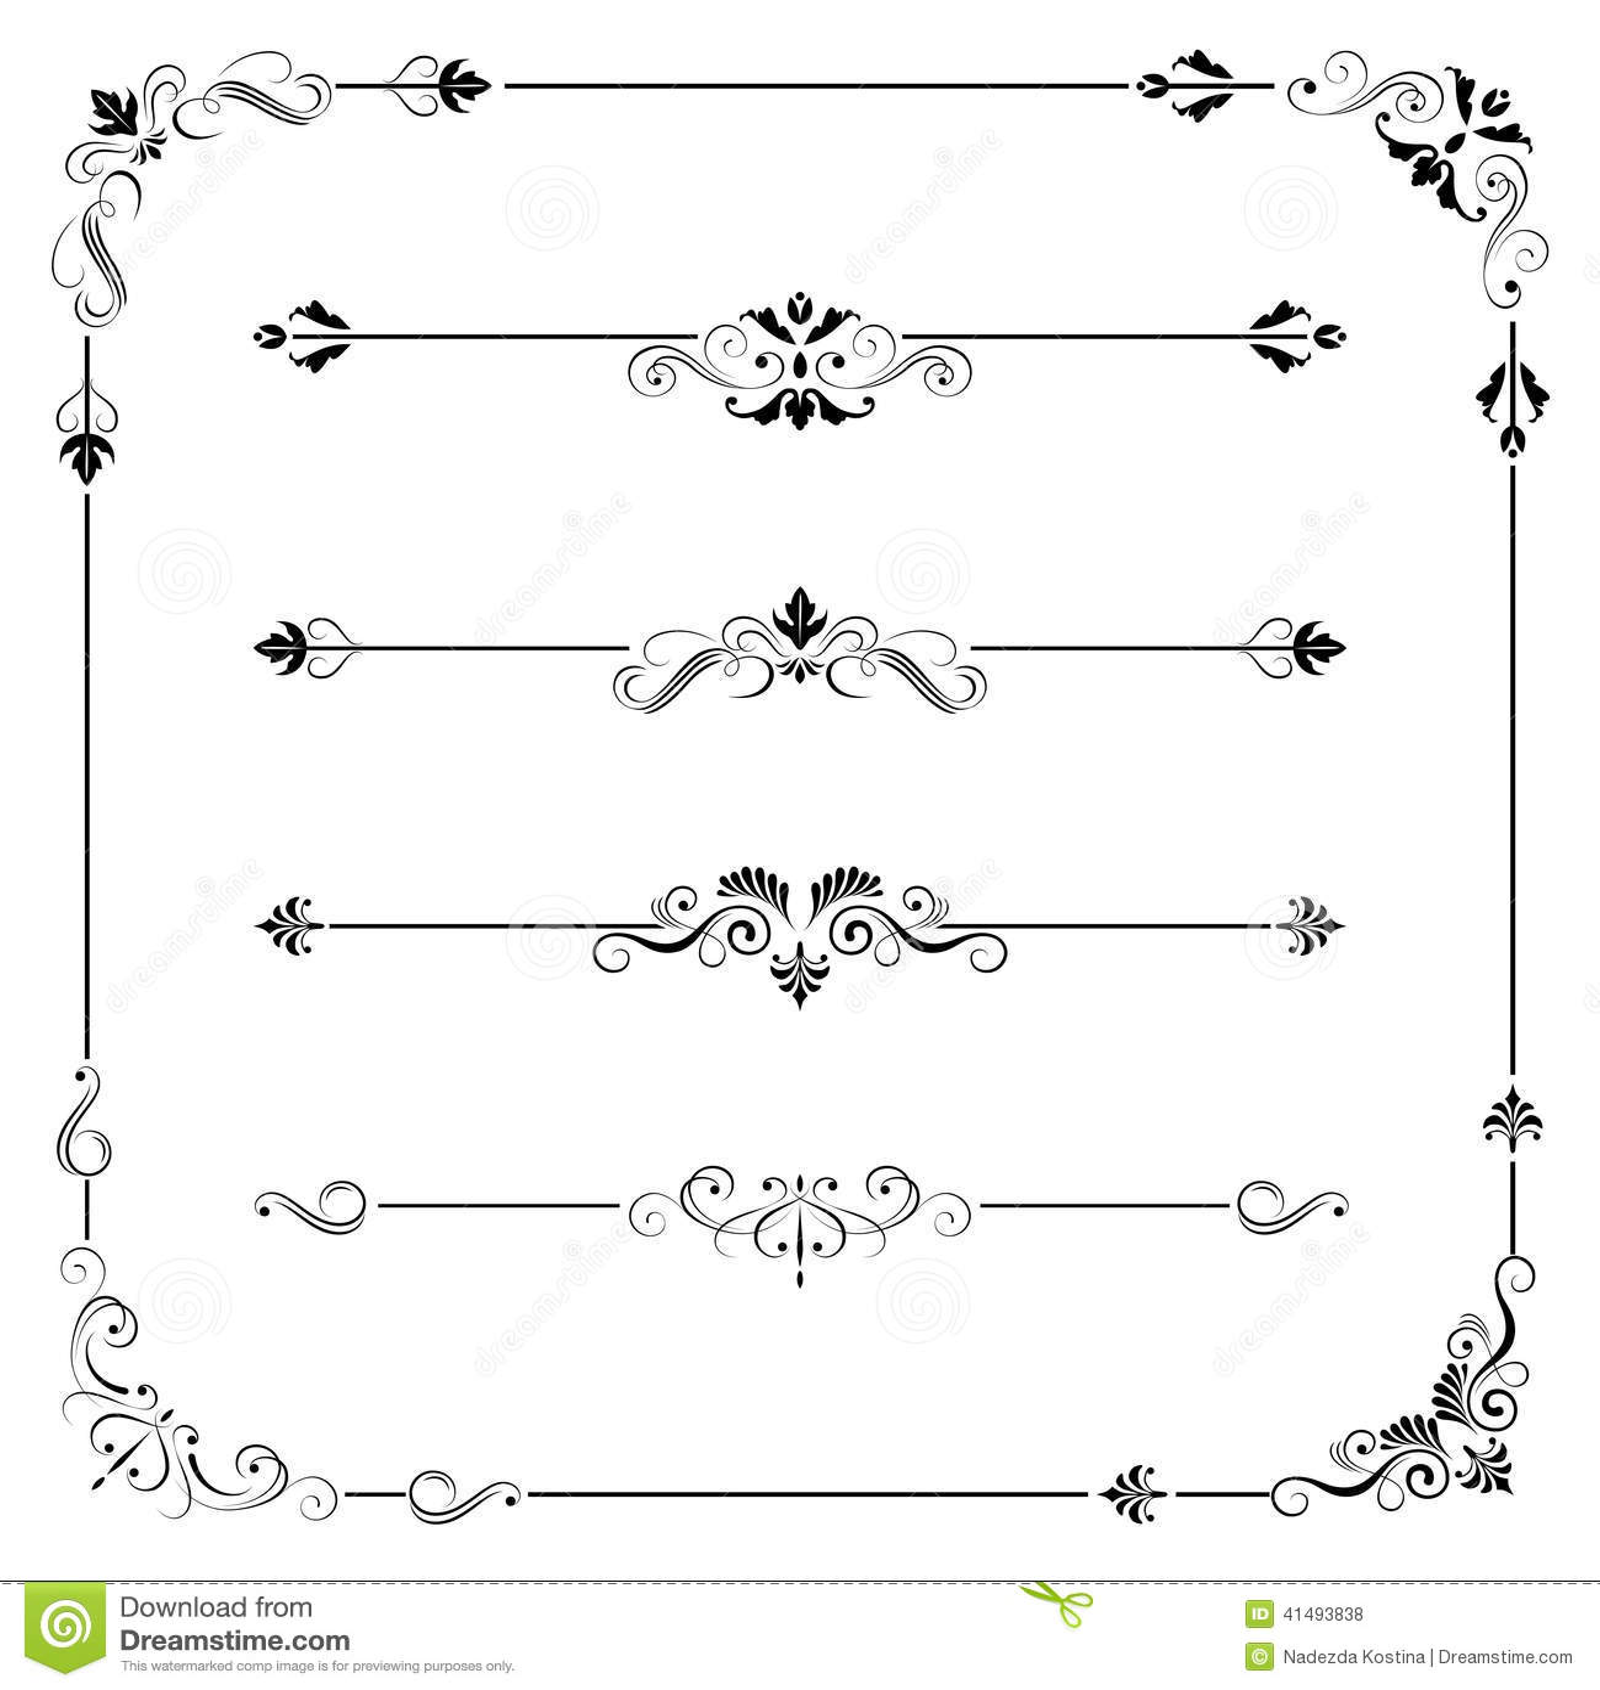 Divider Stock Illustrations, Vectors, & Clipart – (6,521 Stock ...